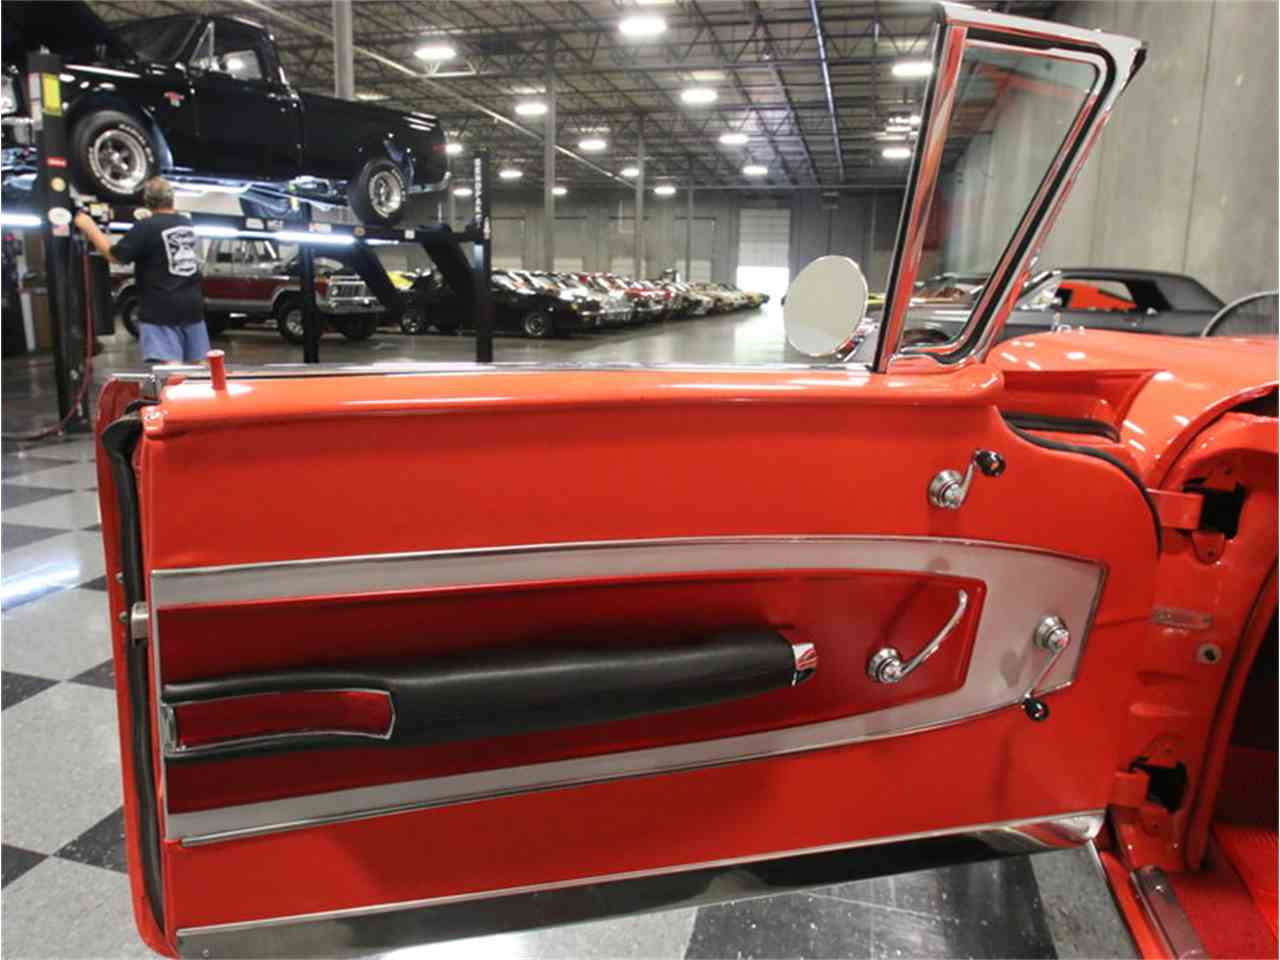 Large Picture of Classic '58 Chevrolet Impala - $106,995.00 - EVGO